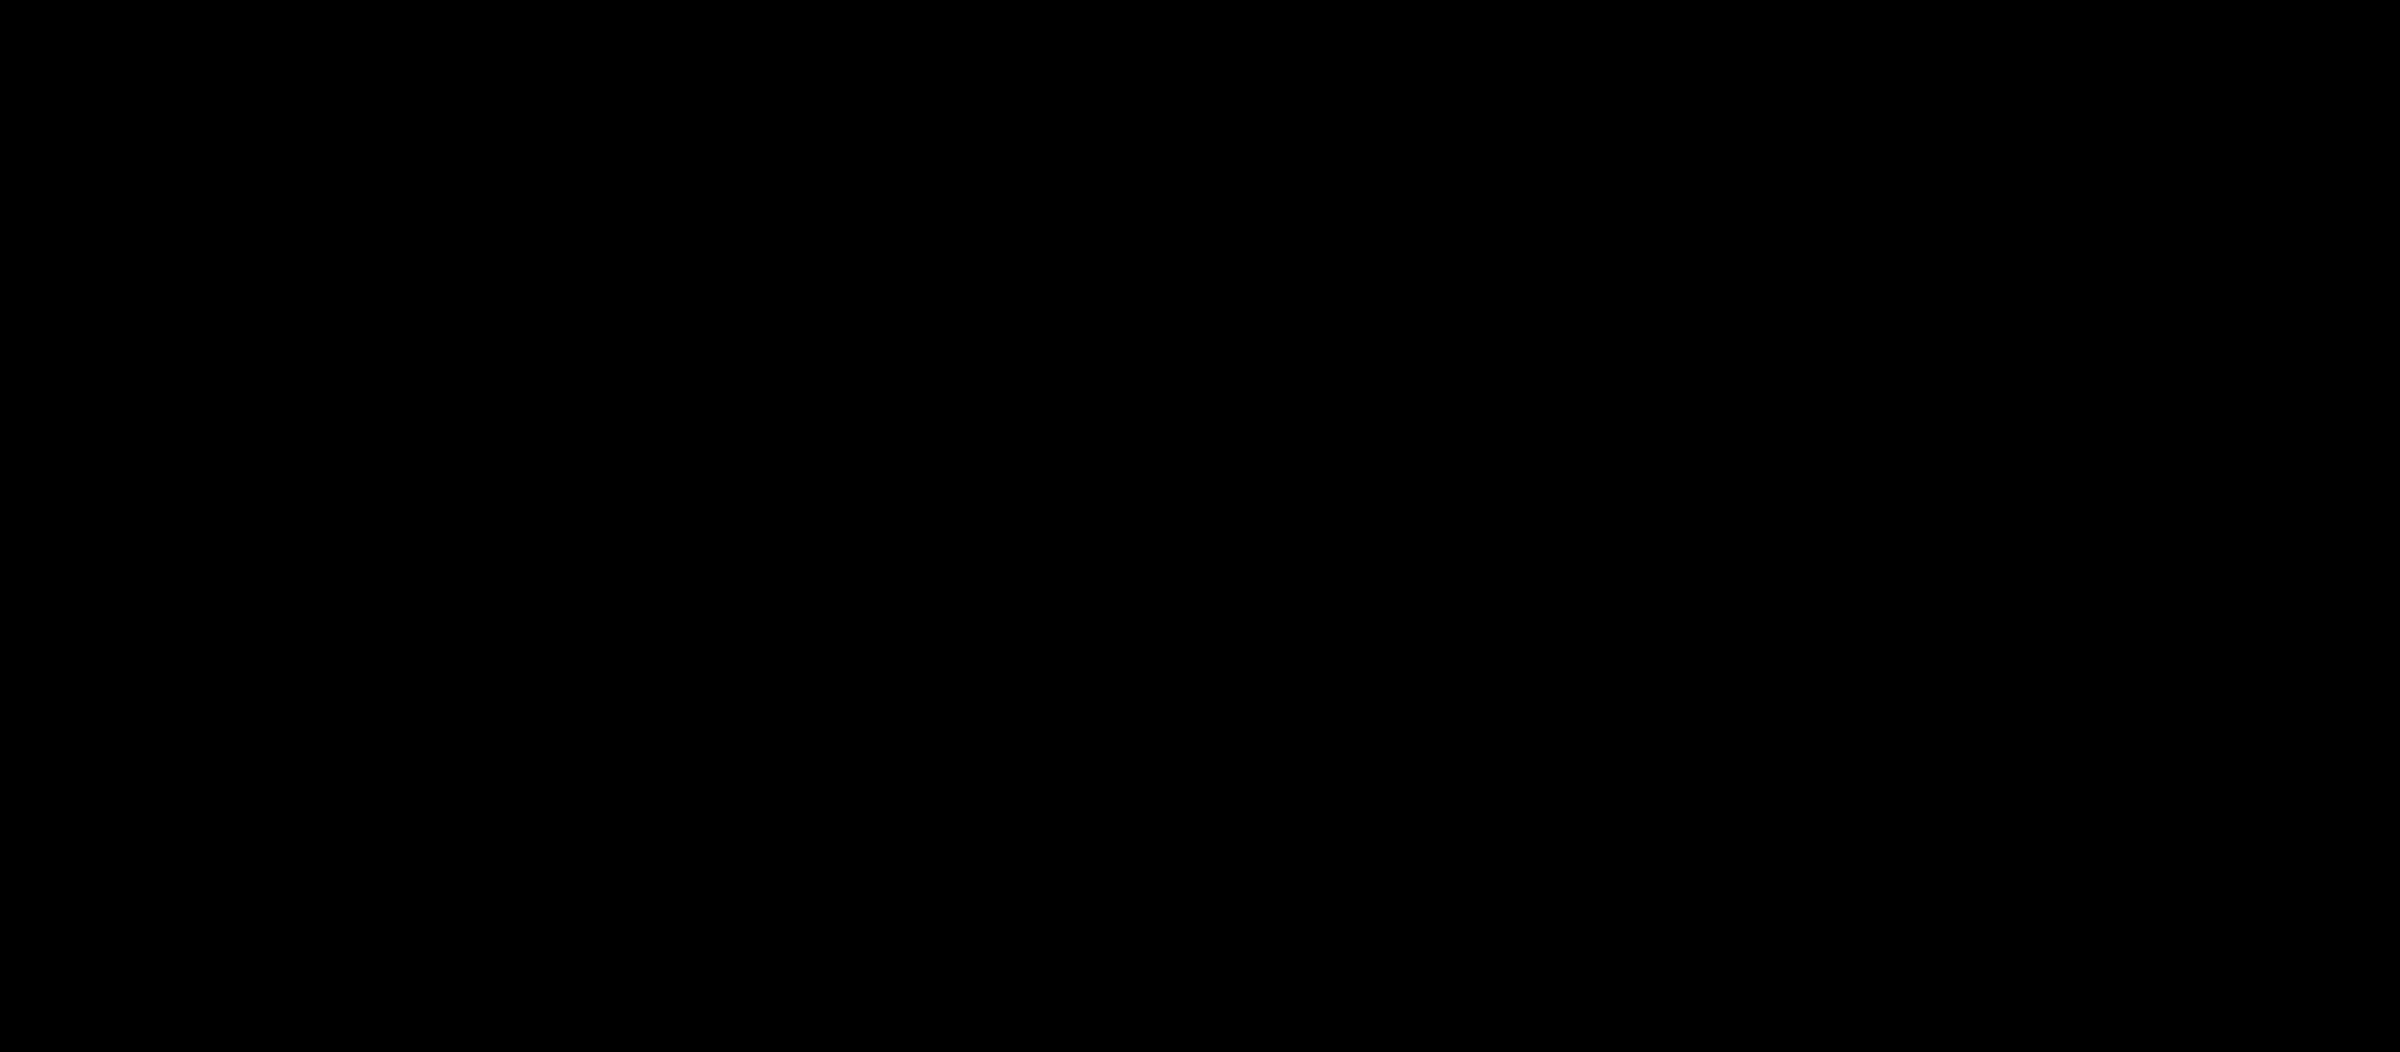 Axe clipart hatchet Clipart Hatchet Hatchet